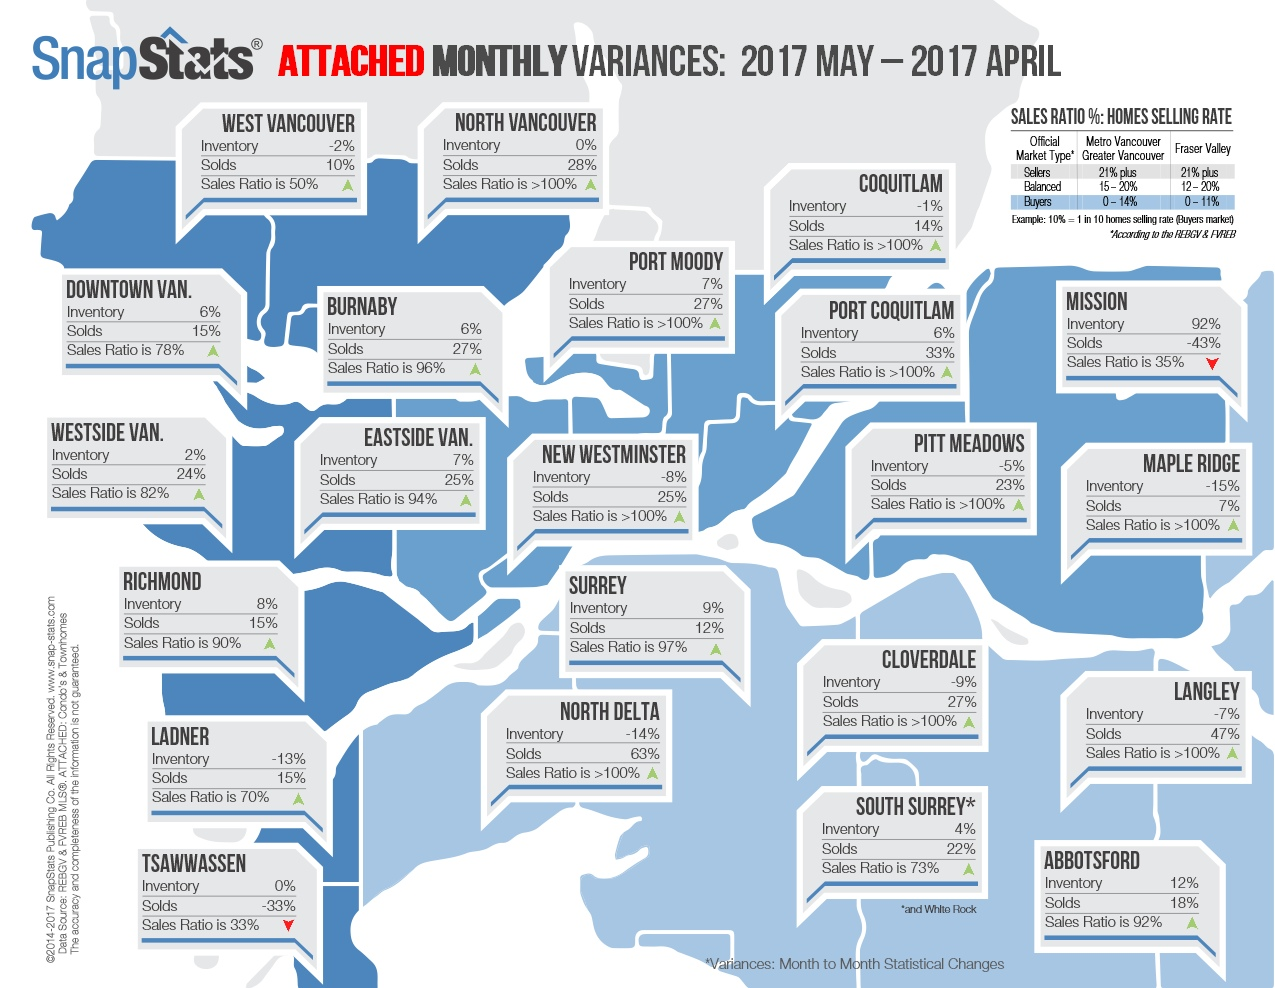 att monthly 2017 may